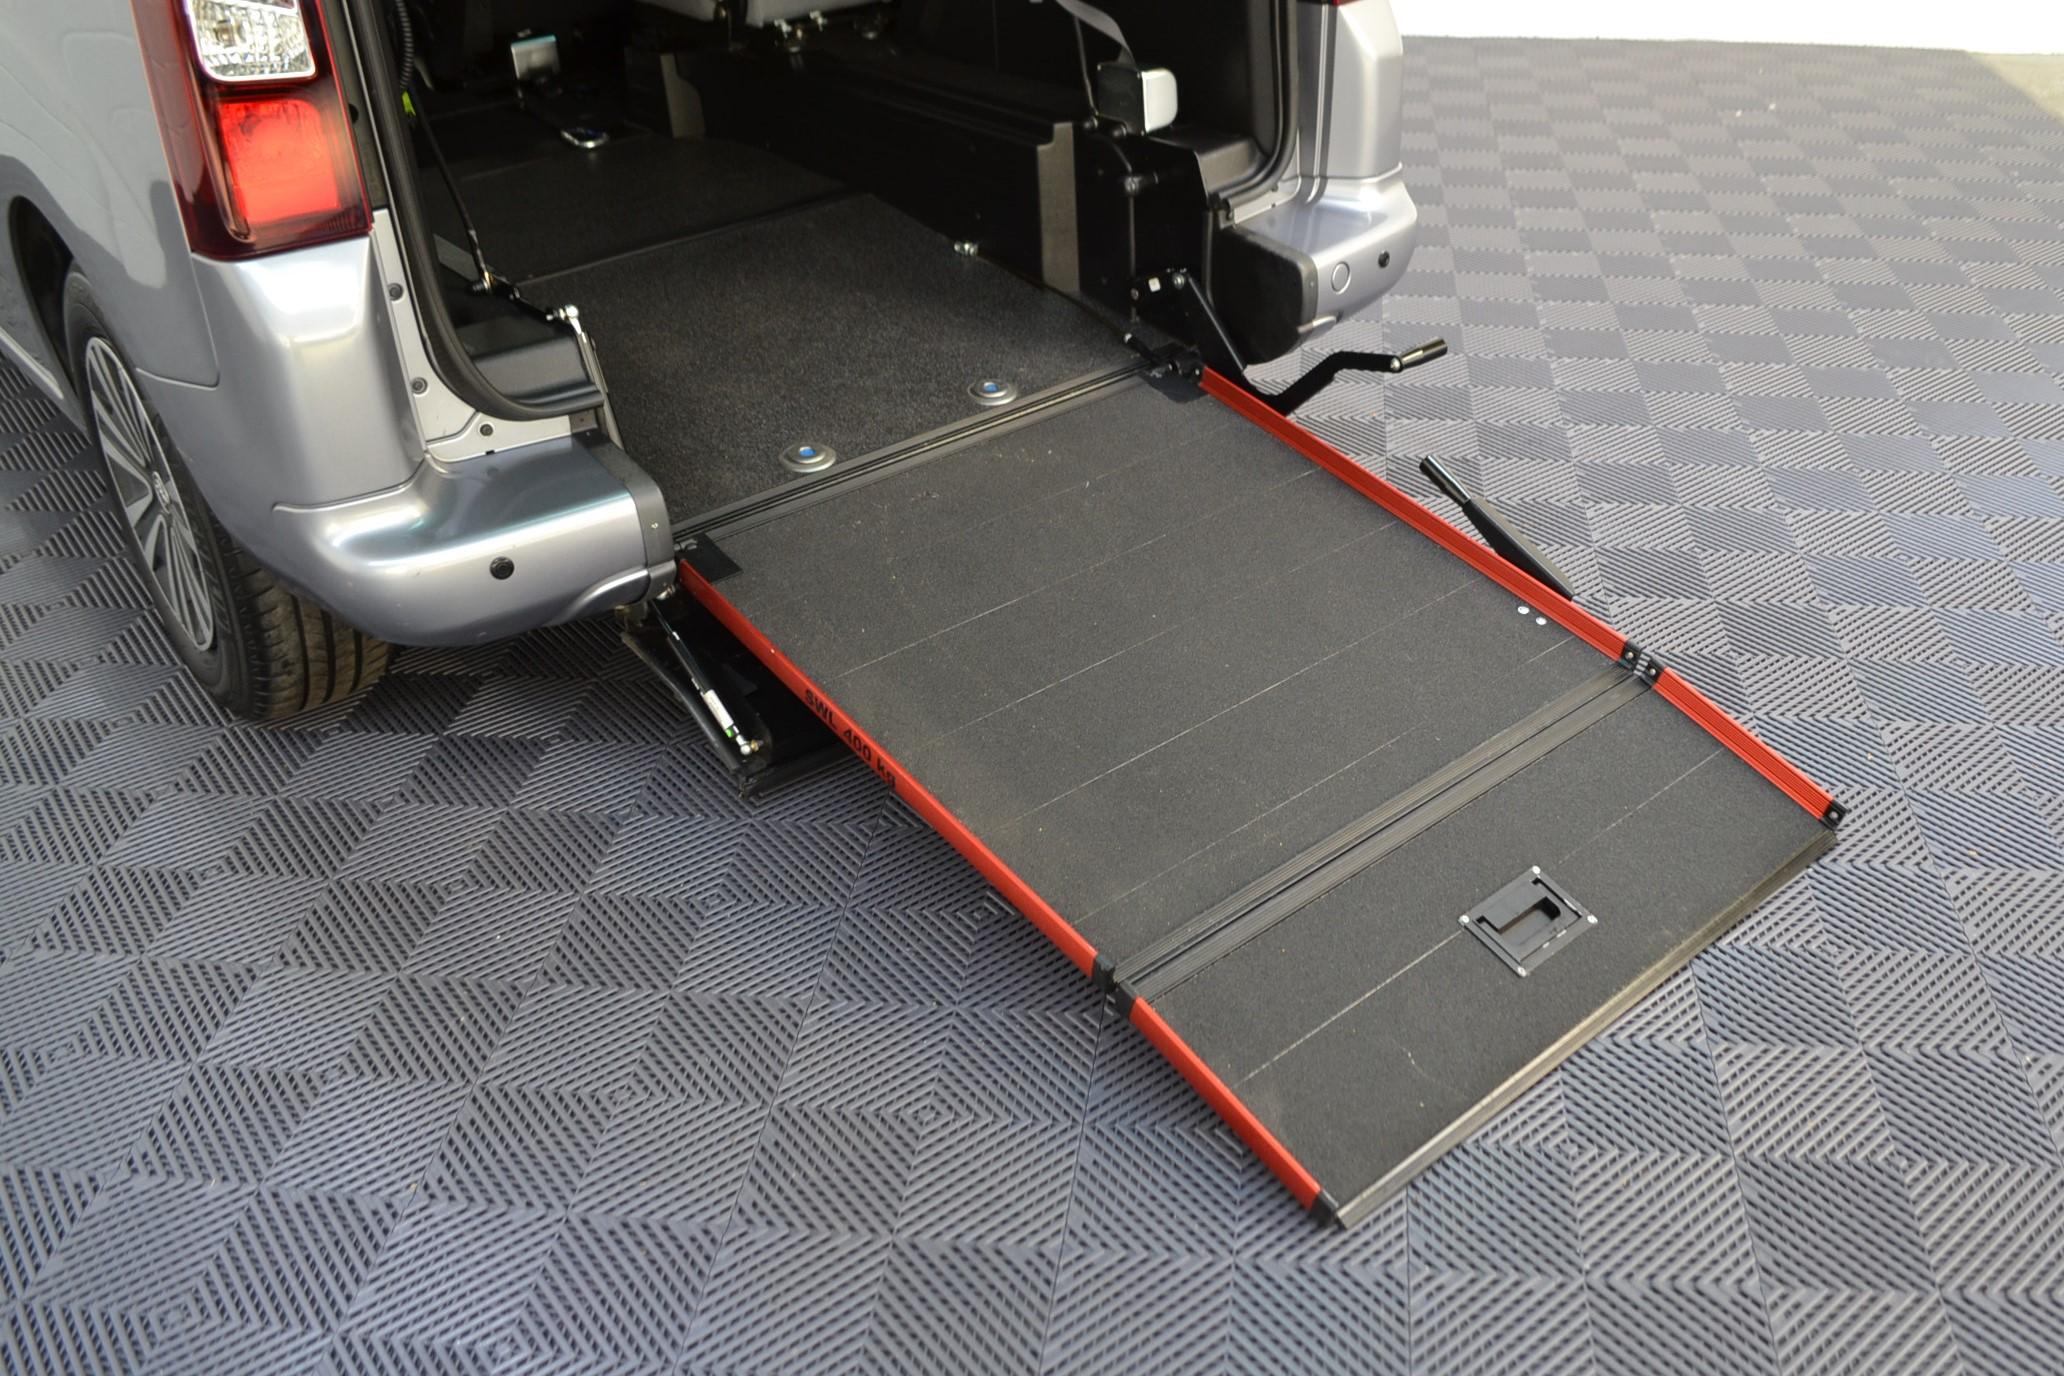 WAV Cars For Sale Bristol Wheelchair Accessible Vehicles Used For Sale Somerset Devon Dorset Bath Peugeot Partner Auto 9